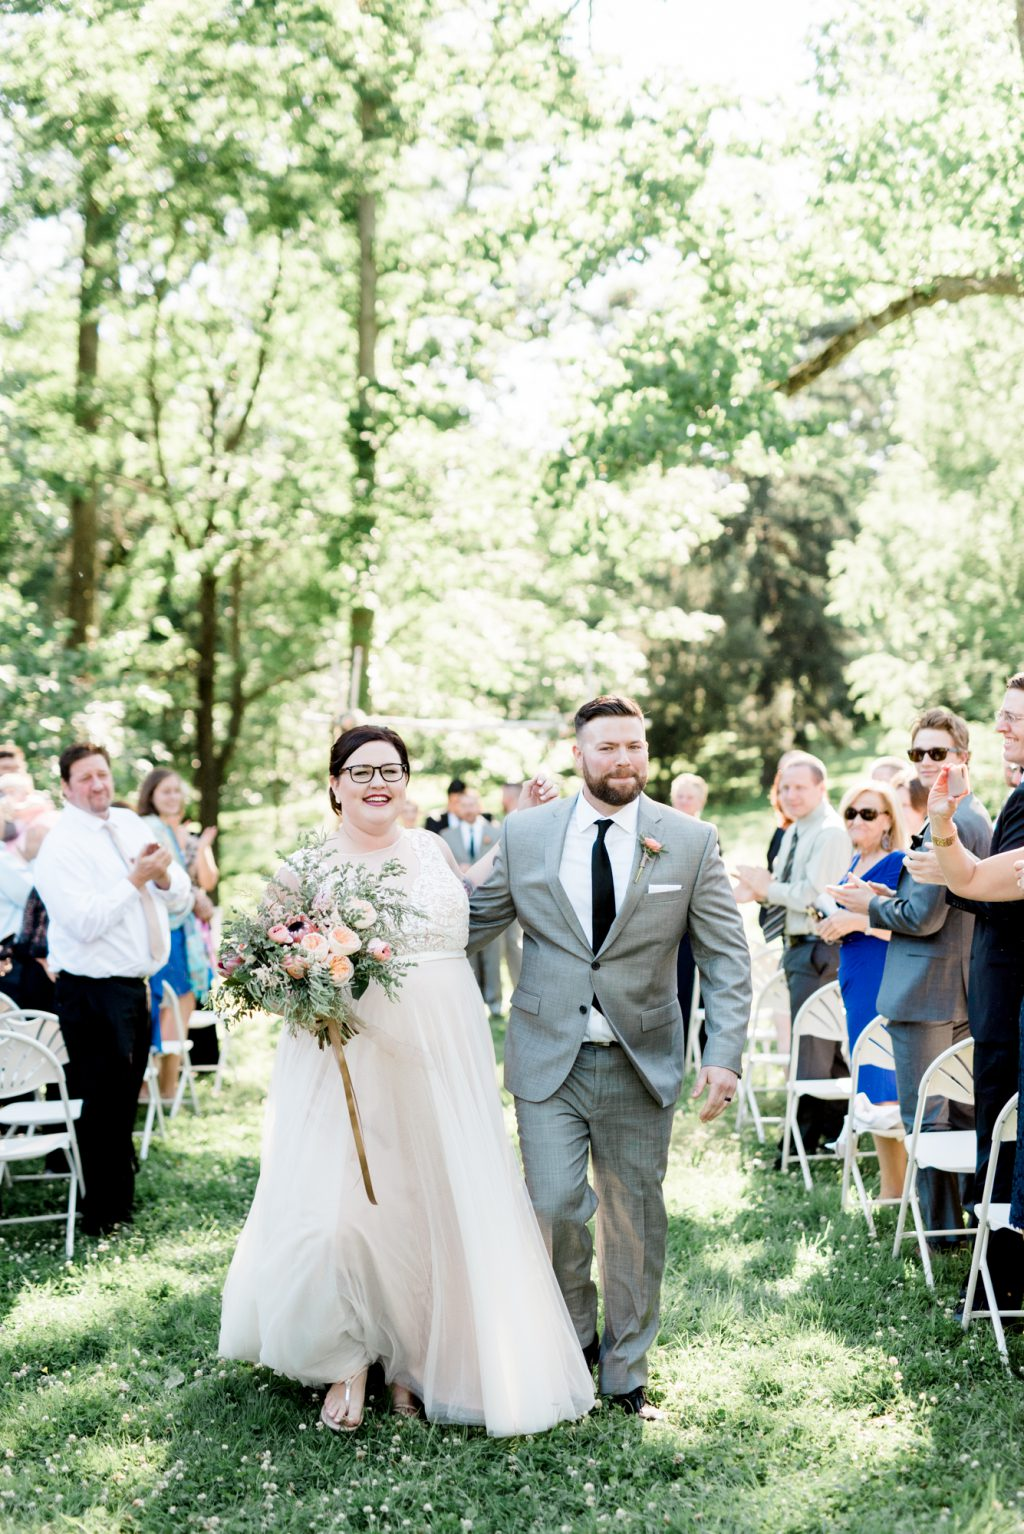 haley-richter-photo-west-chester-summer-wedding-boxcar-brewery-128